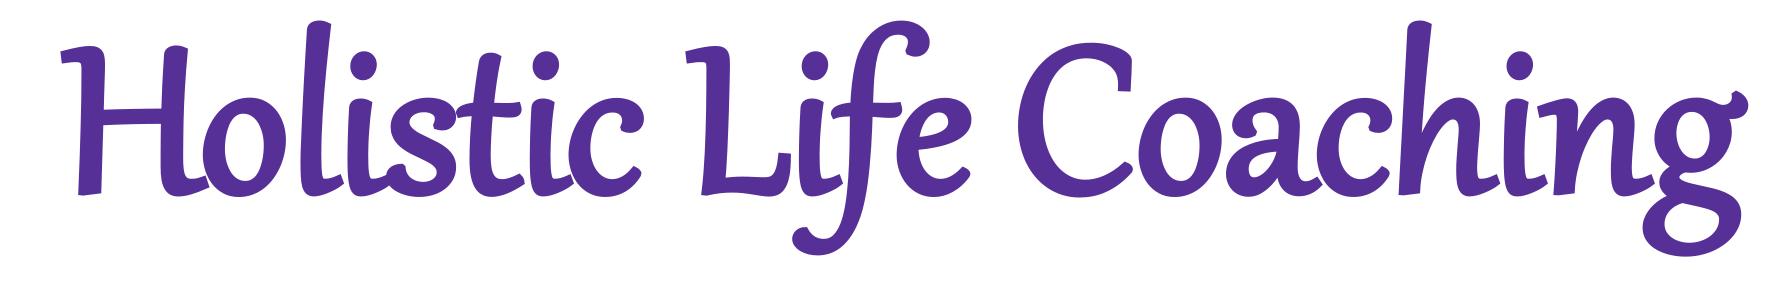 Holistic Life Coaching Word.png